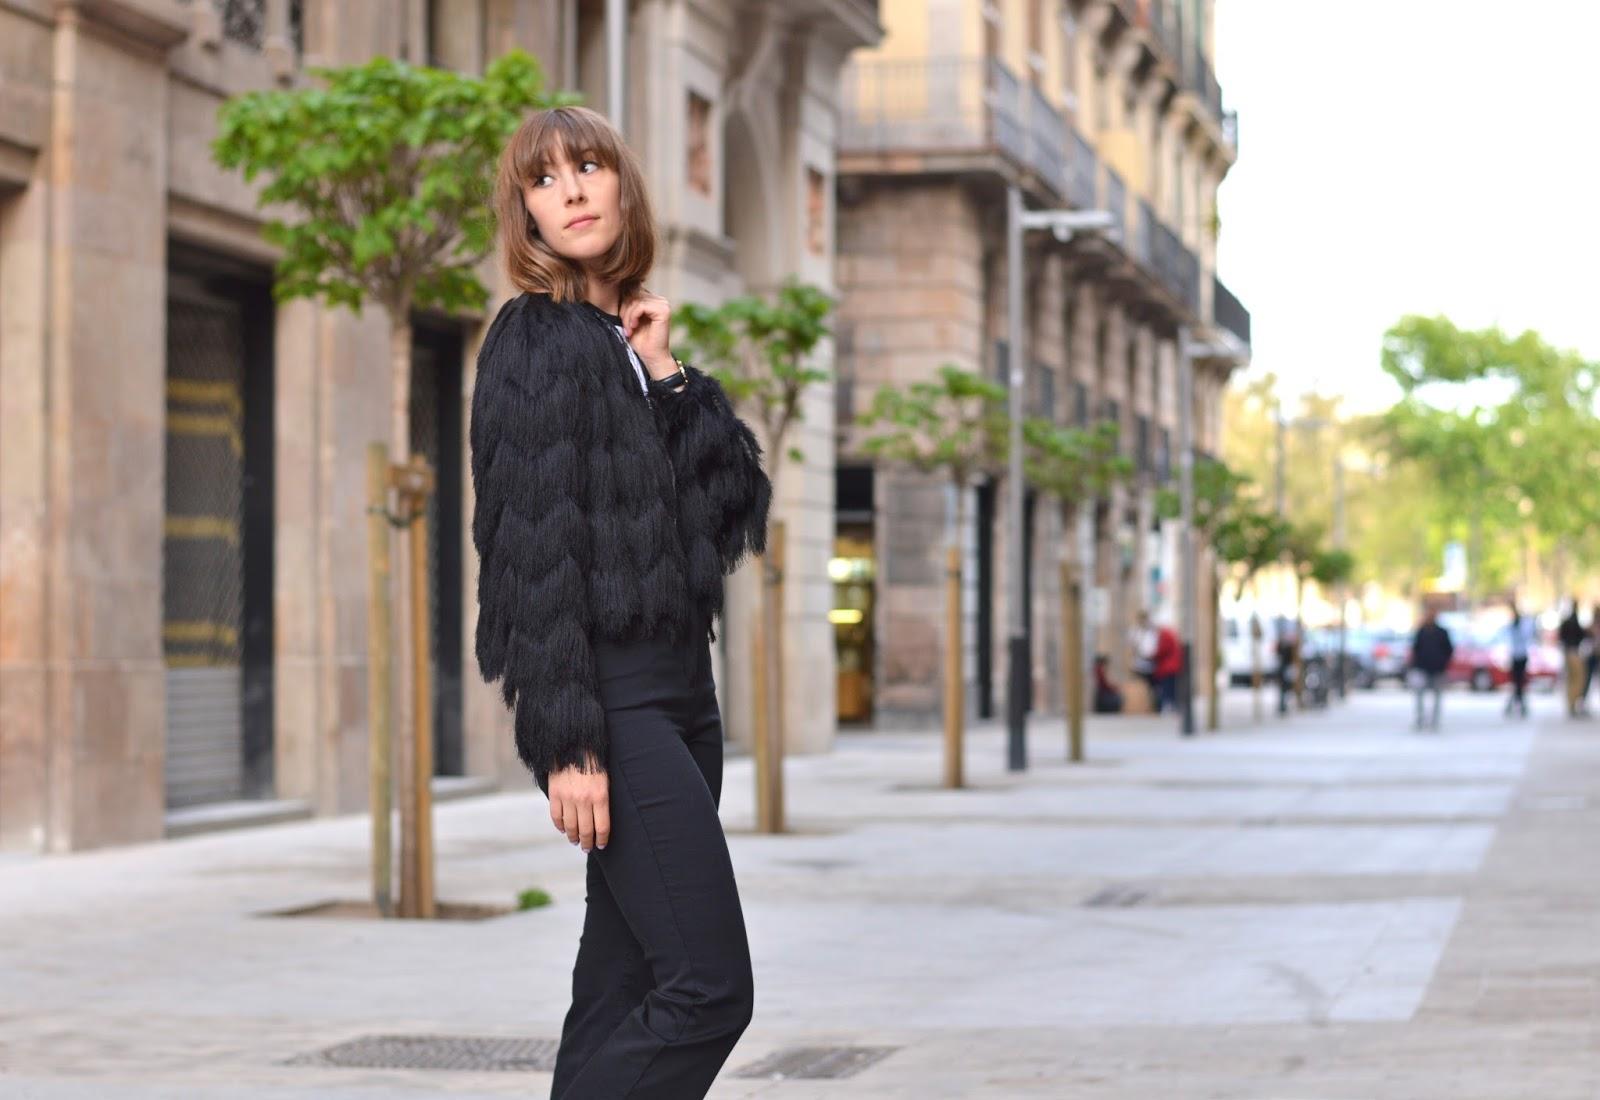 How to wear style tassel jacket, kick flares and platform espadrilles